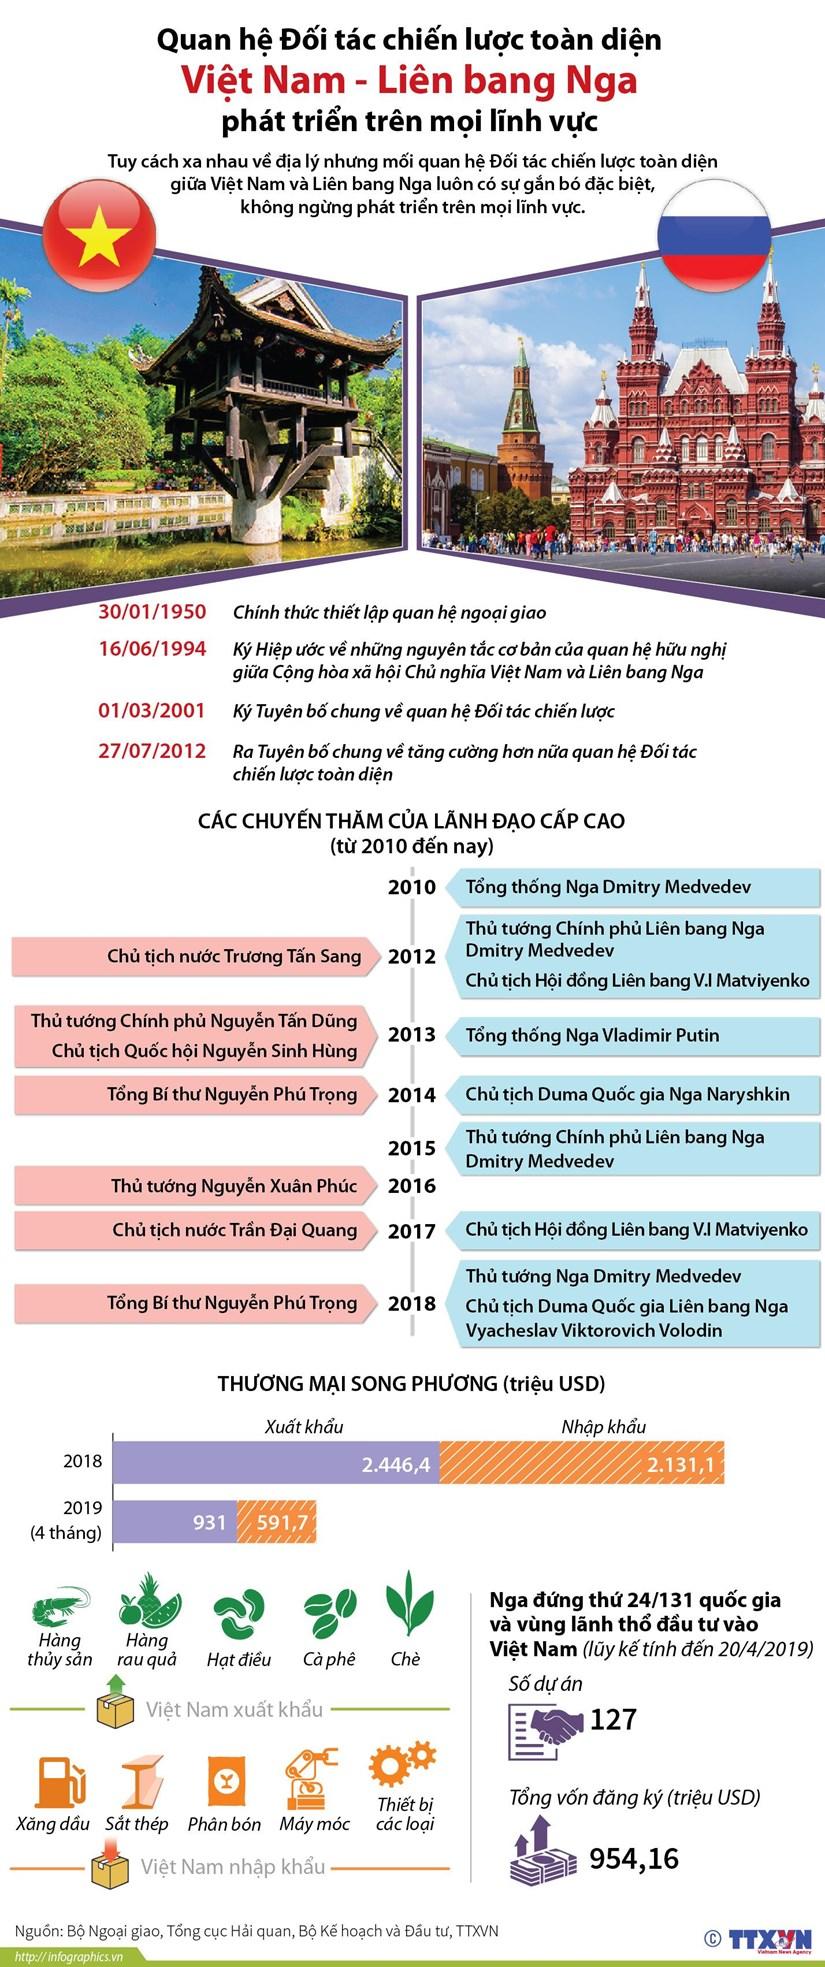 [Infographics] Quan he Doi tac chien luoc toan dien Viet Nam-Nga hinh anh 1